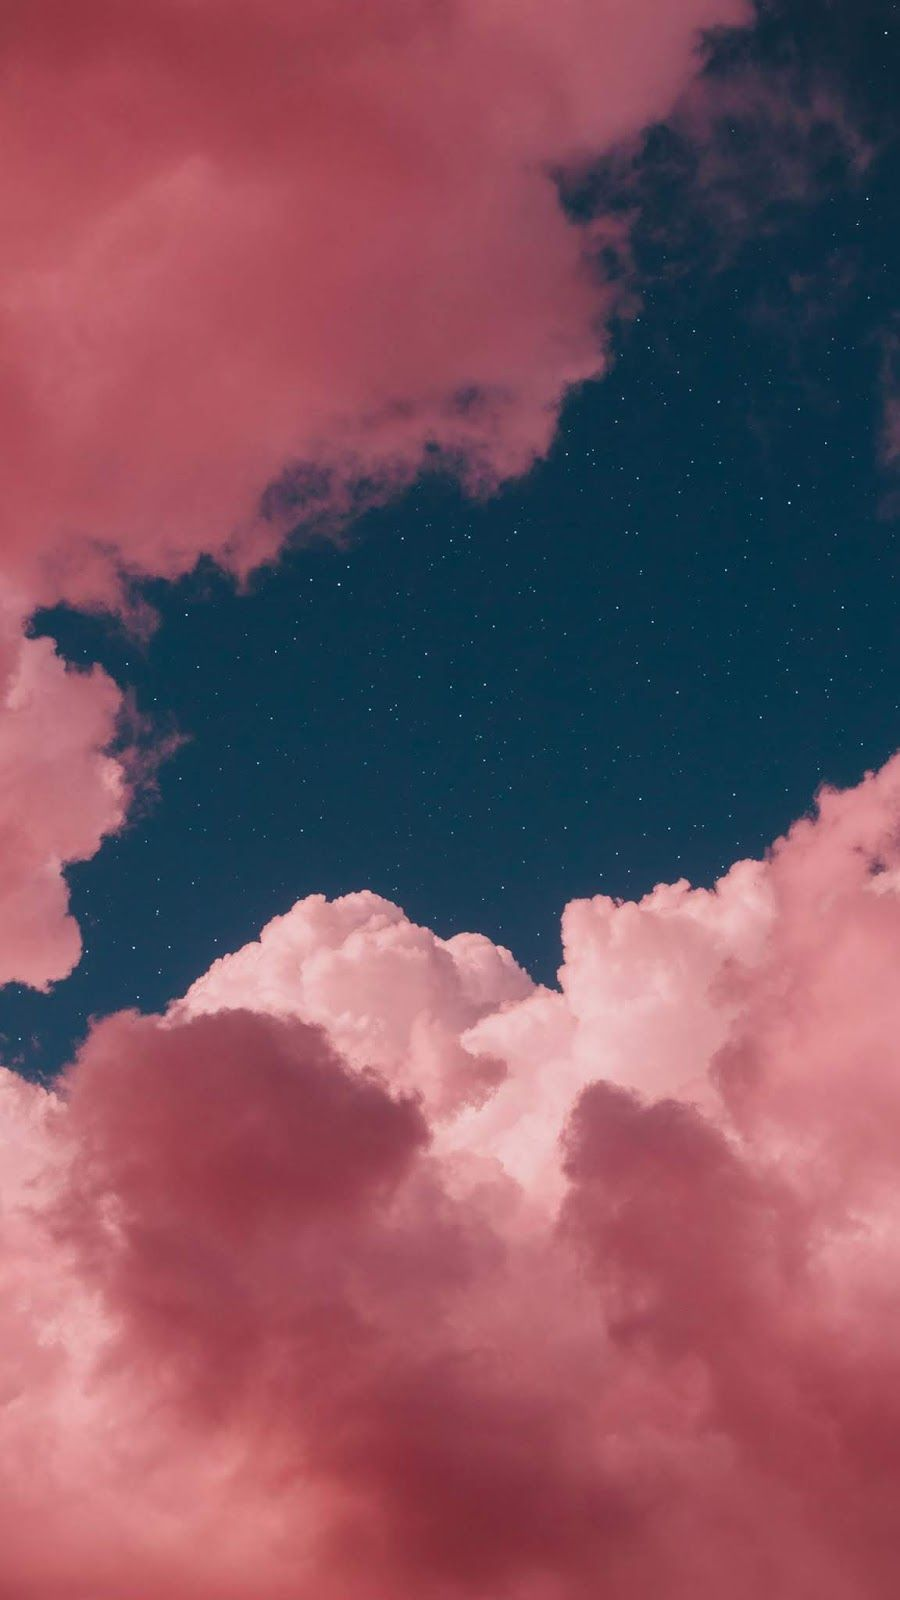 Pink Clouds Pink Clouds Wallpaper Cloud Wallpaper Pink